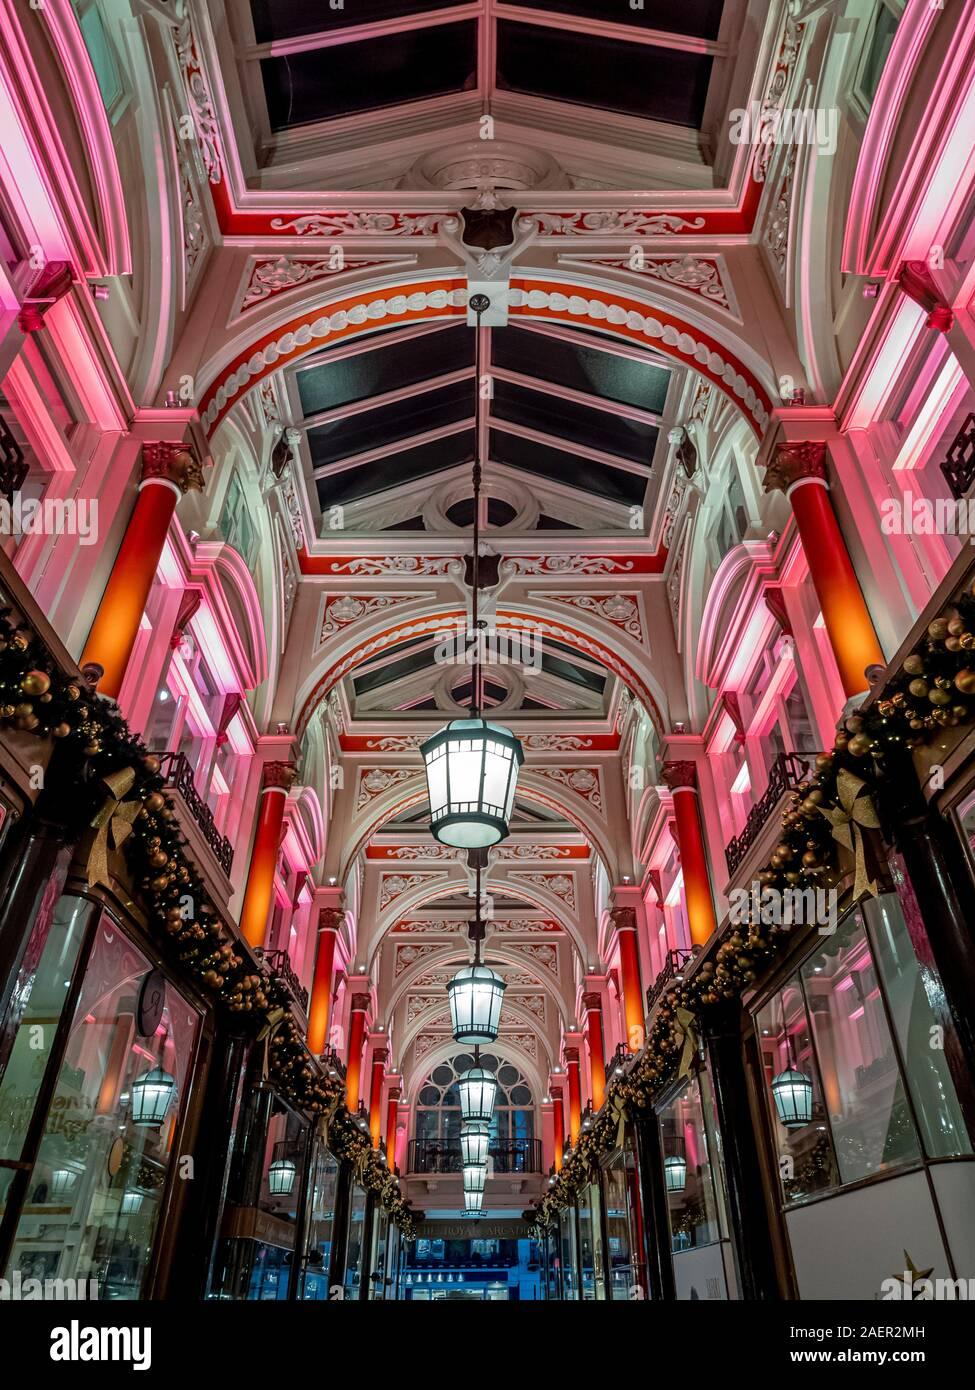 The Royal Arcade at Christmas, New Bond Street, London, UK. Stock Photo